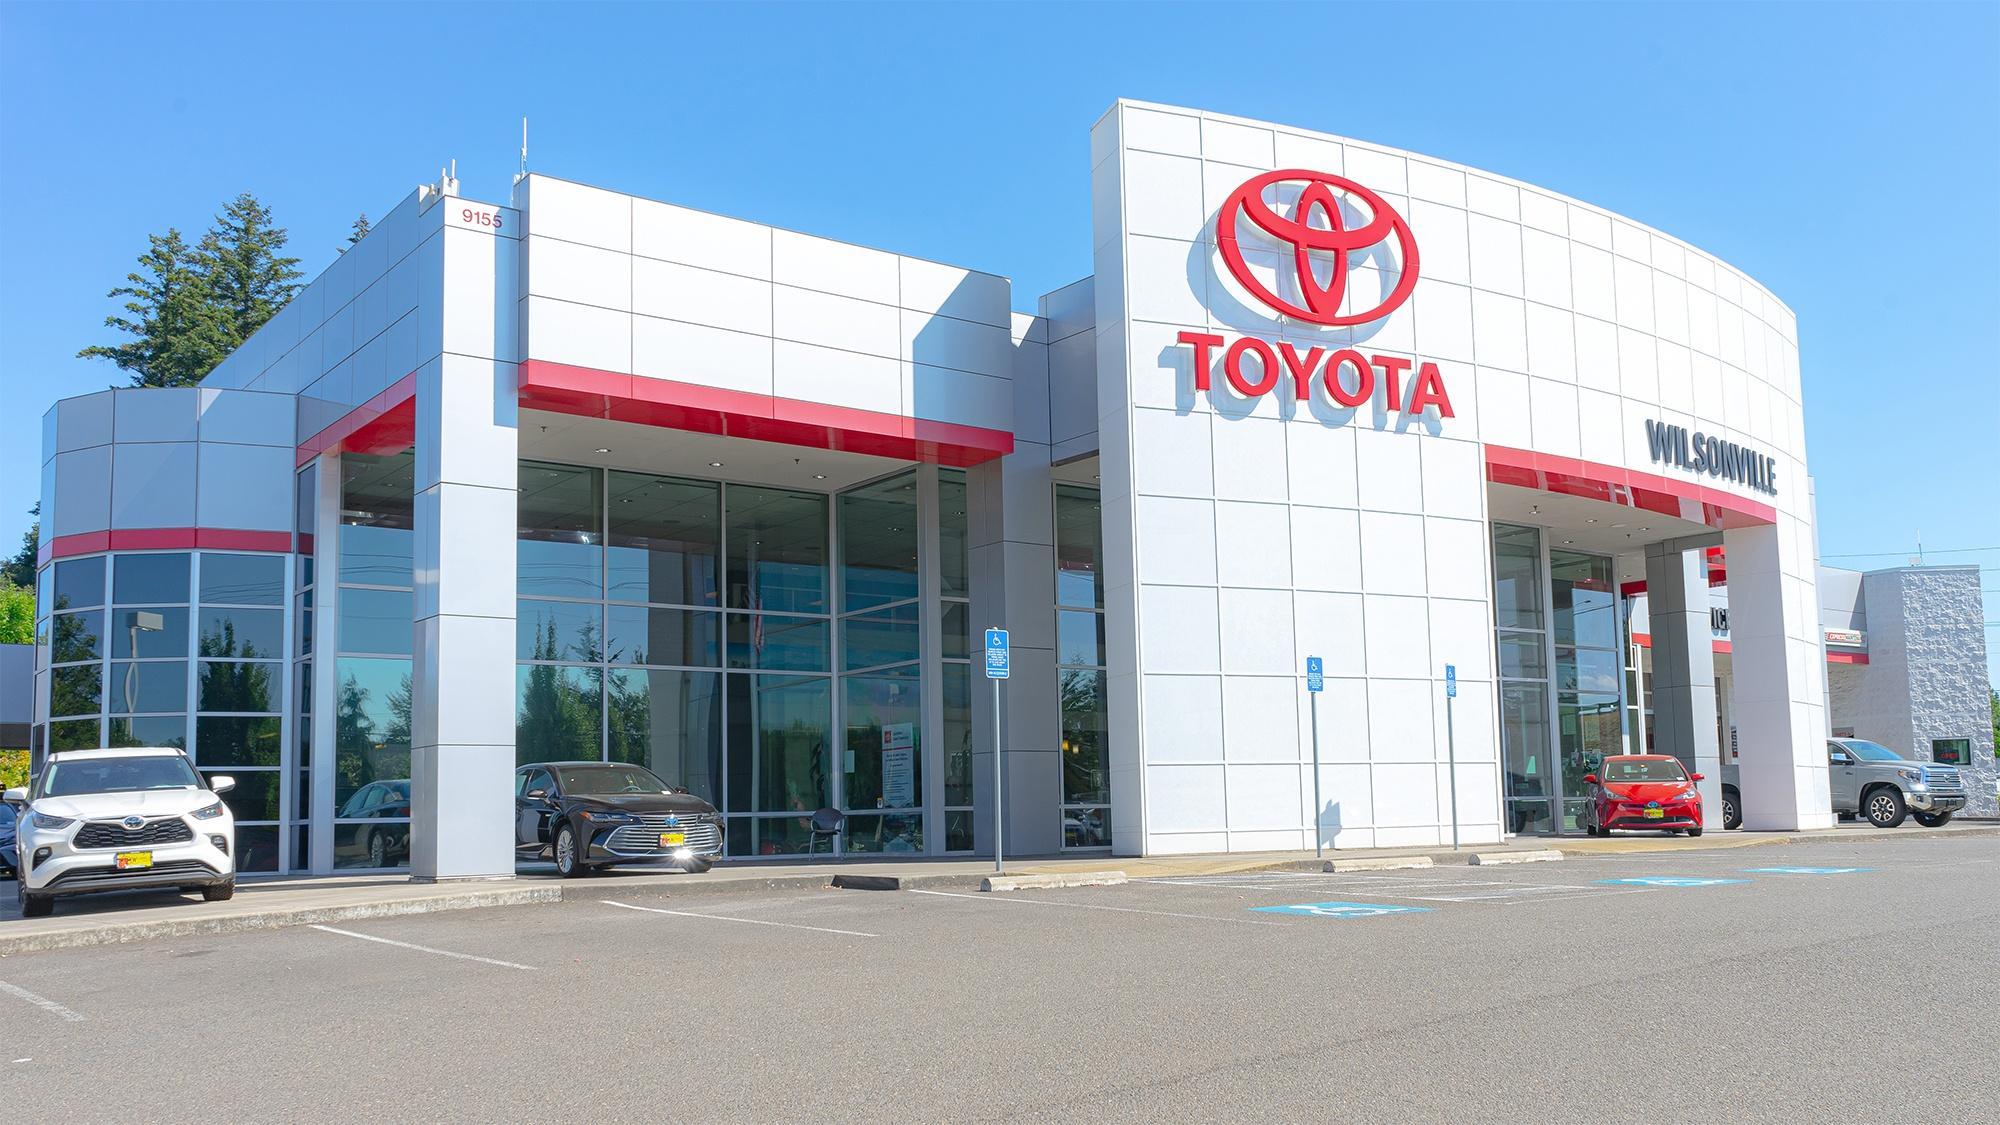 Wilsonville Toyota